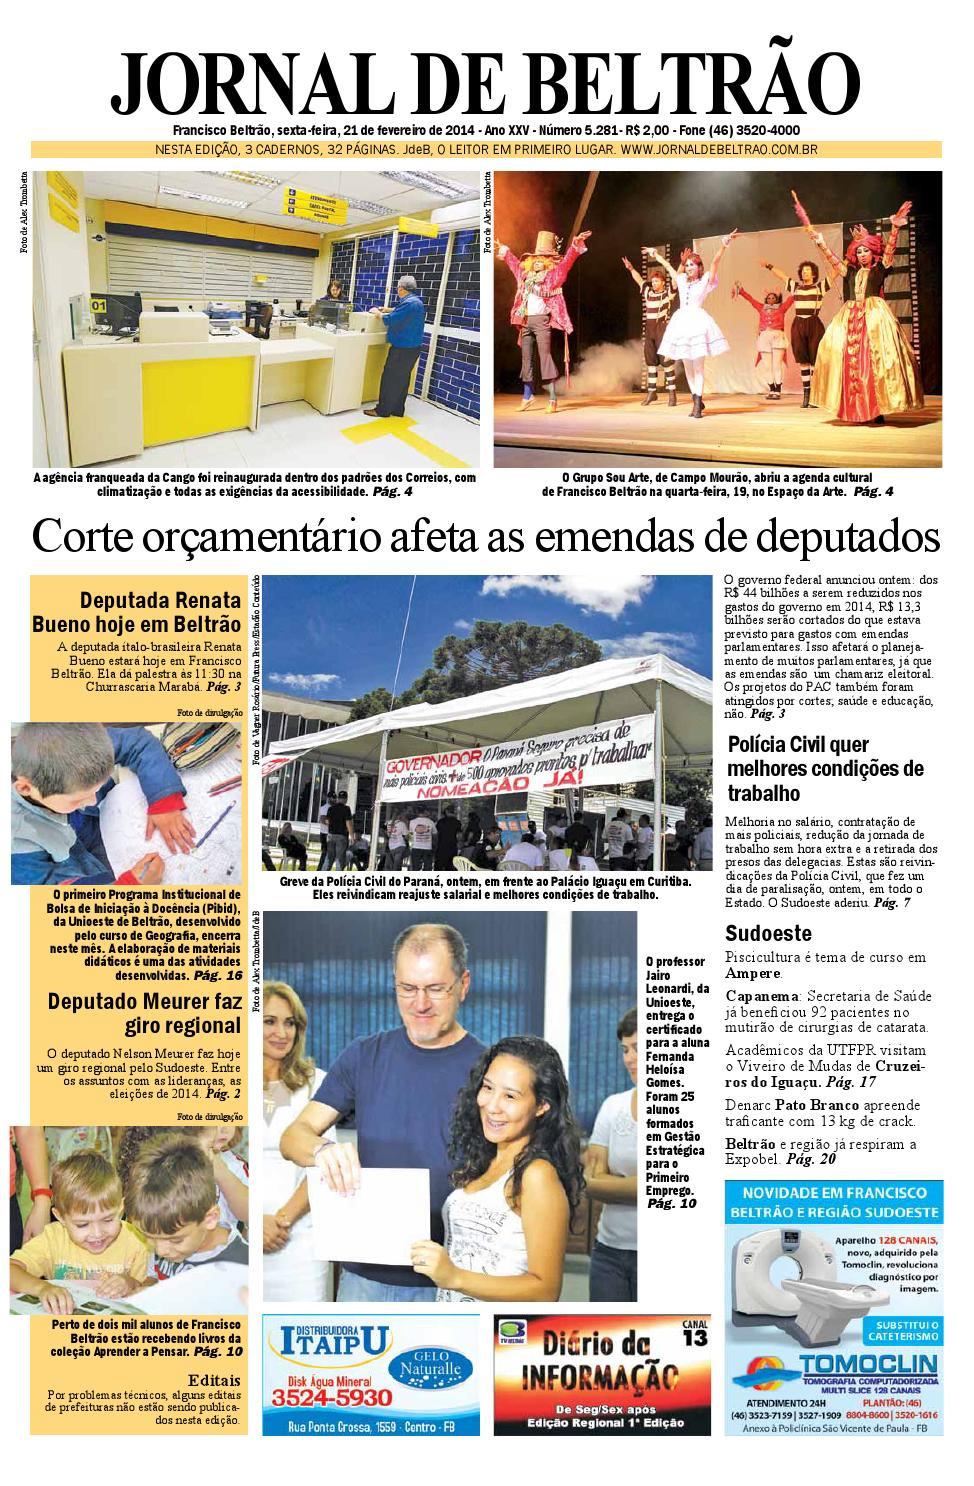 jornaldebeltrão 5281 2014-02-21.pdf by Orangotoe - issuu 9340fe23f6